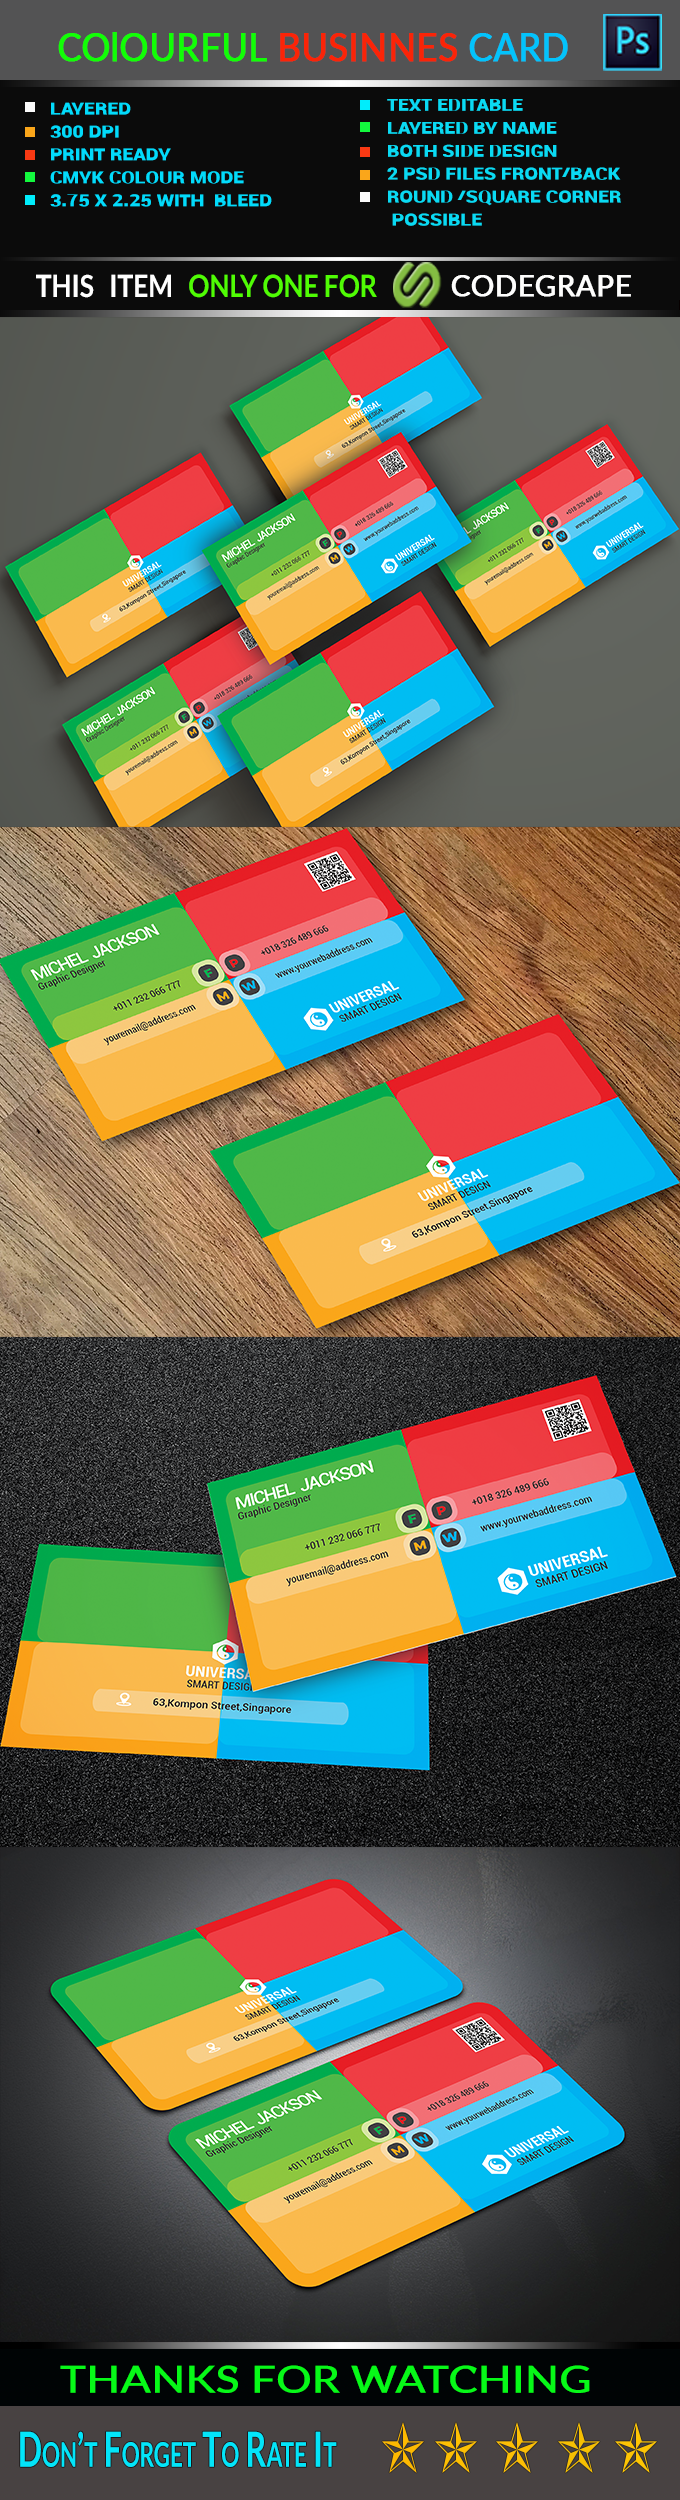 Modern Colourful Business Card